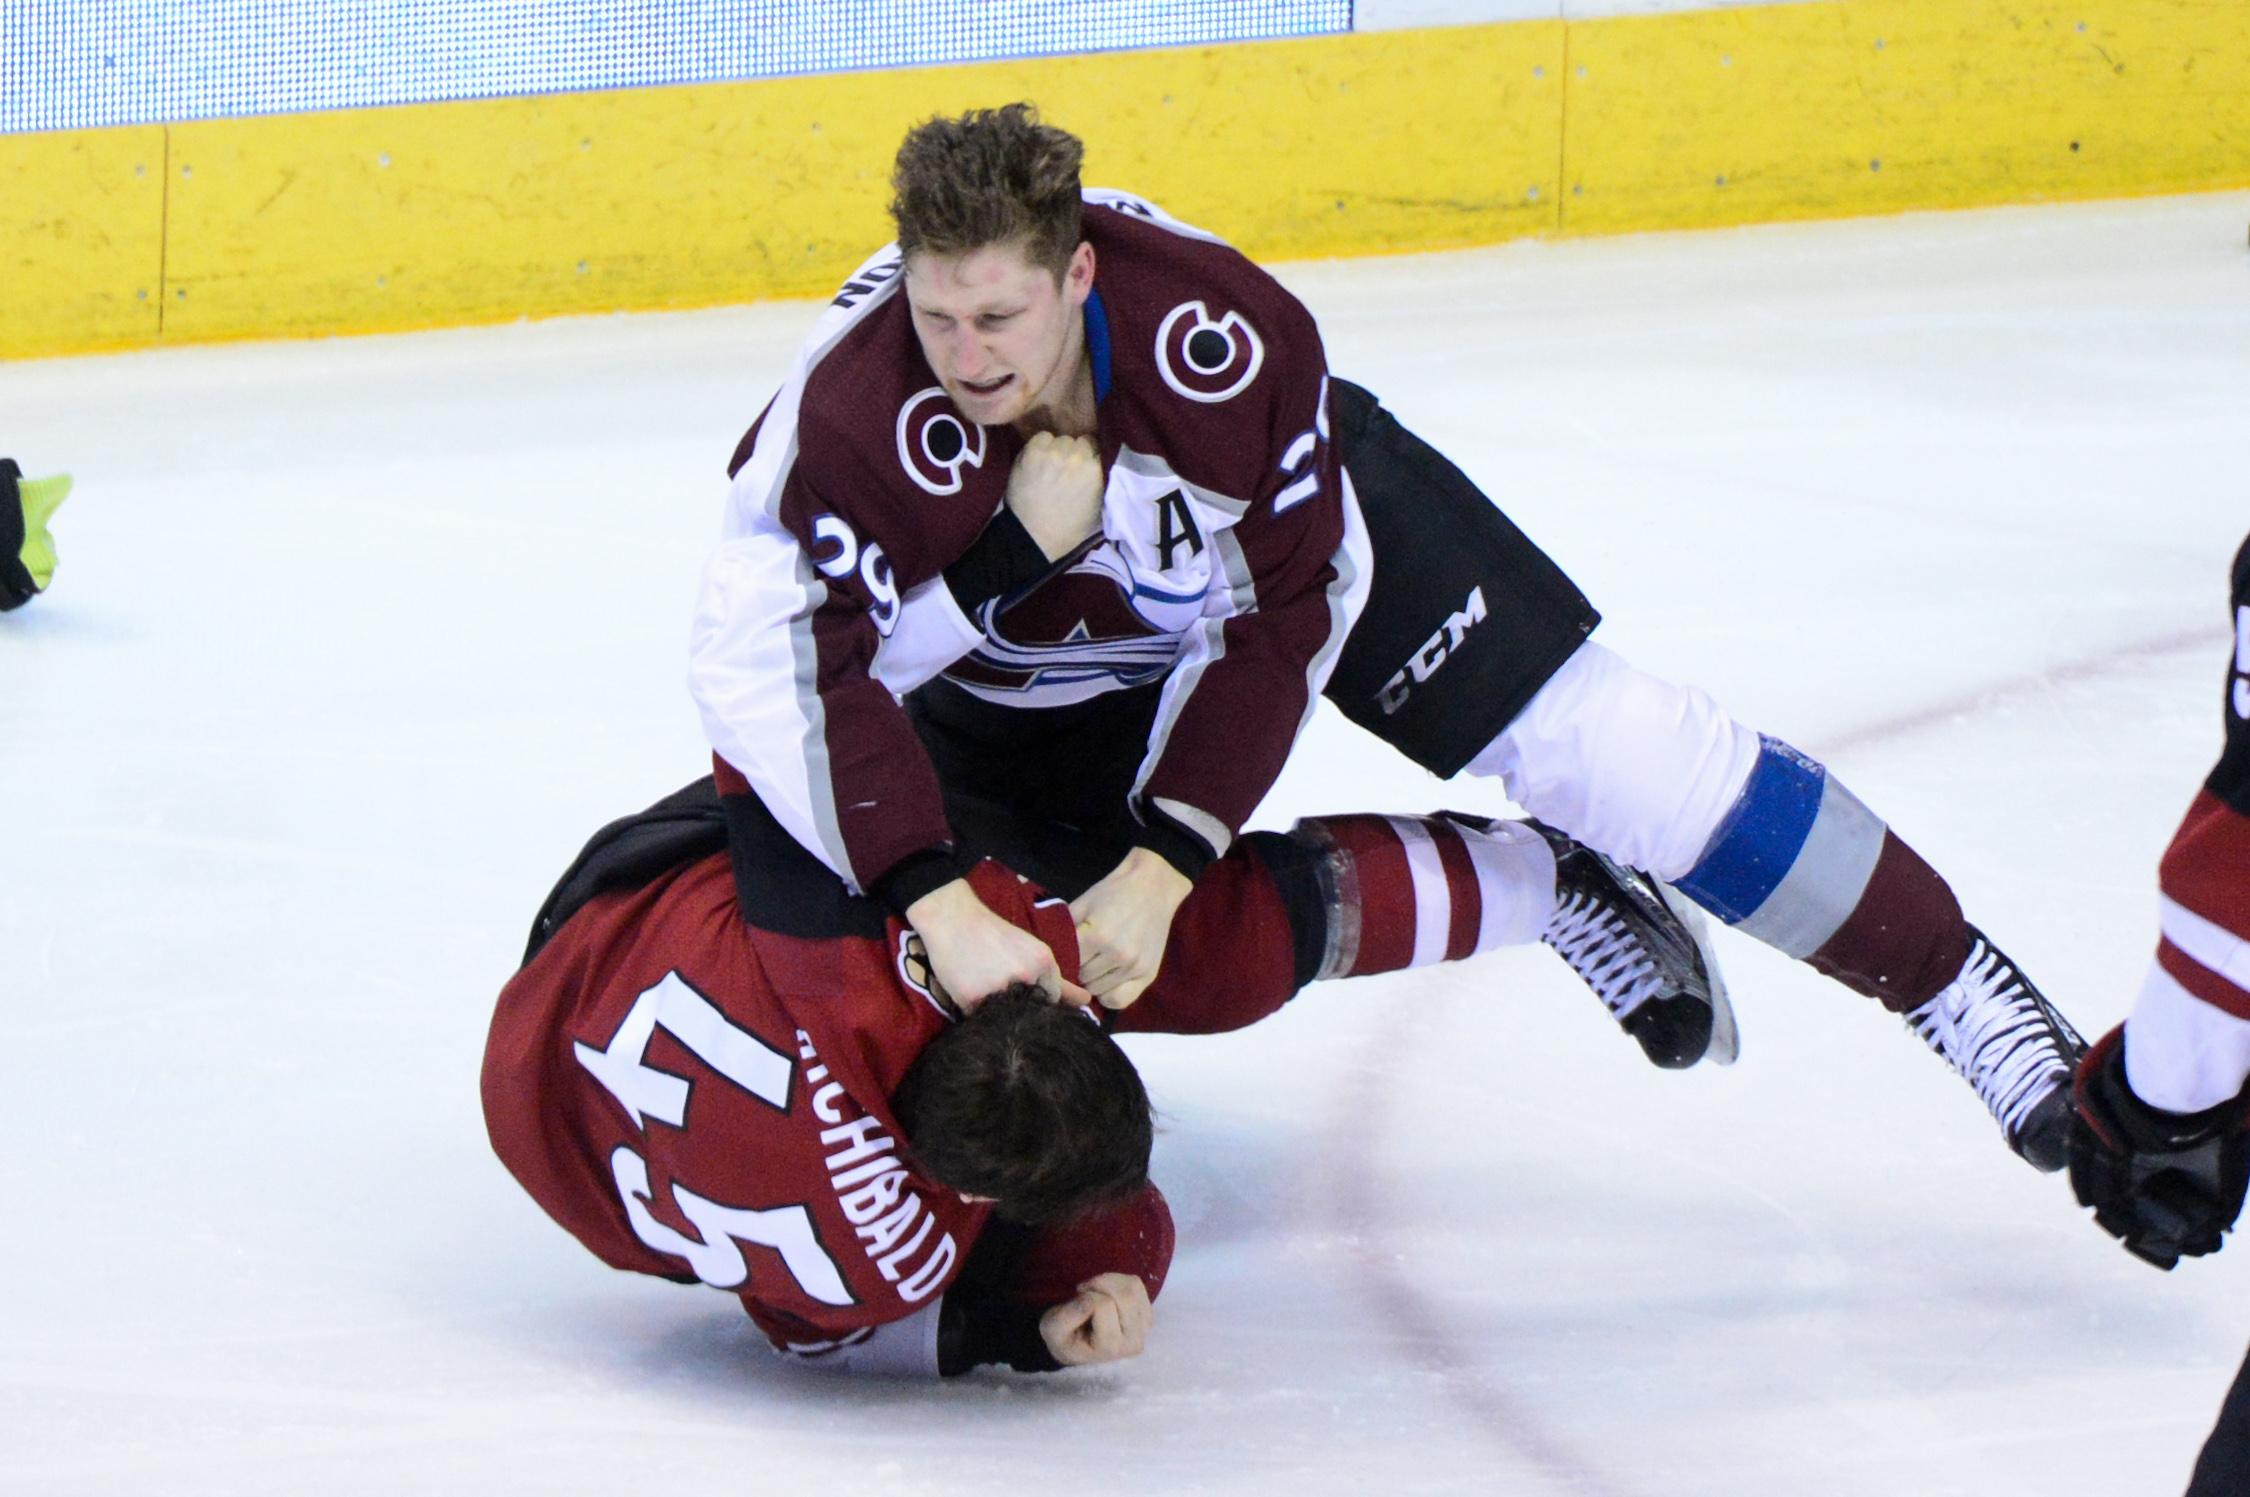 NHL: Colorado Avalanche at Arizona Coyotes